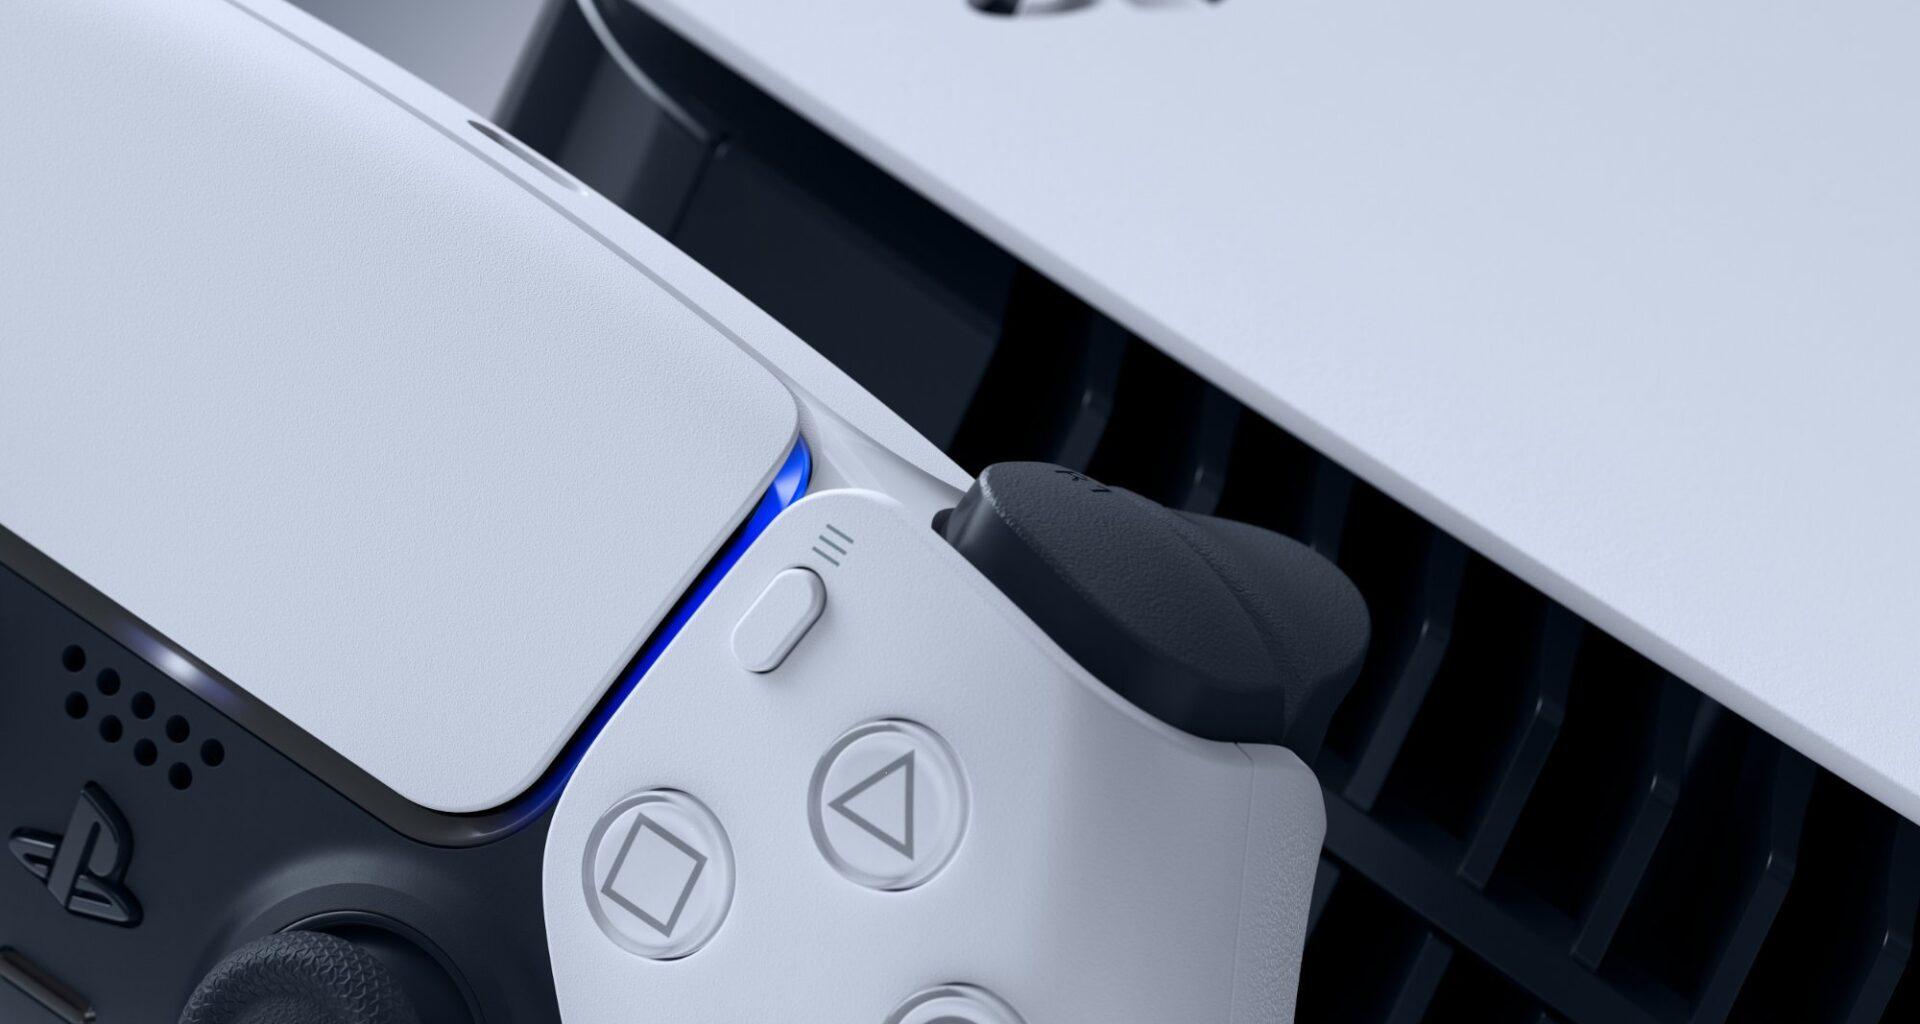 Sony explose son record de ventes avec la PS5 - www.heavybull.com